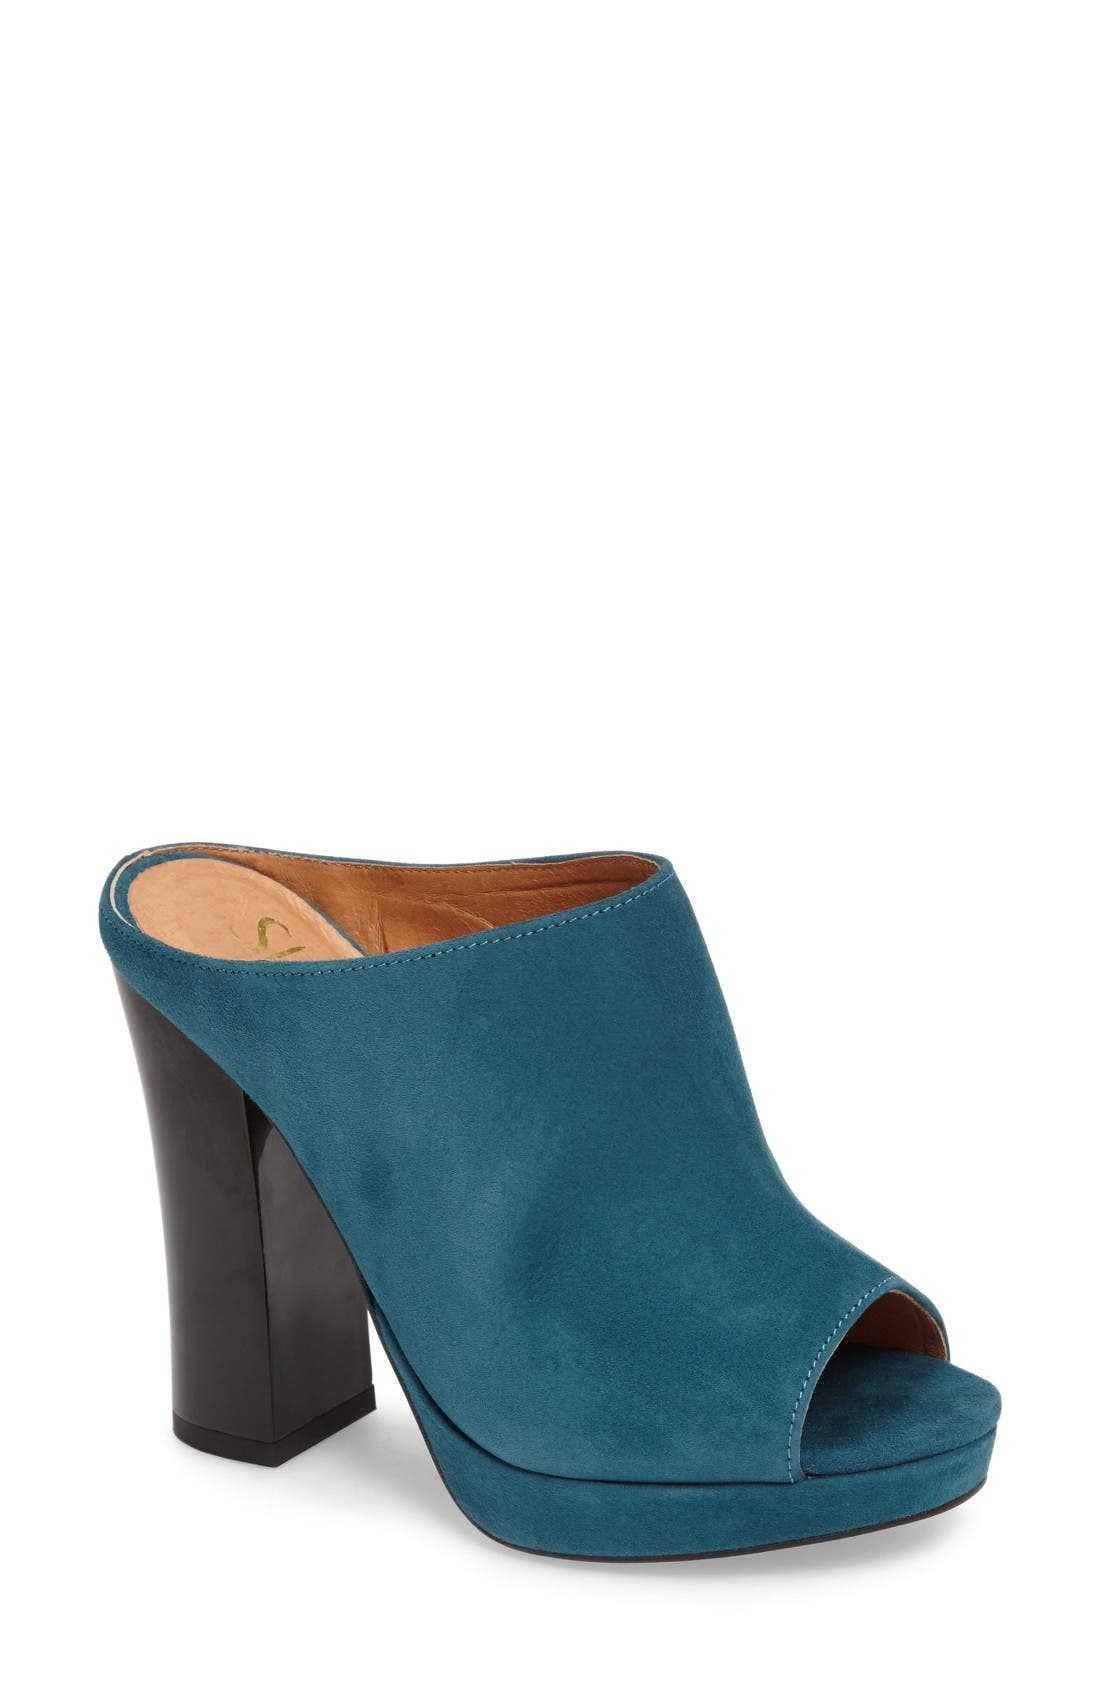 Shellys London Trent Peep-Toe Platform Mule (Women)